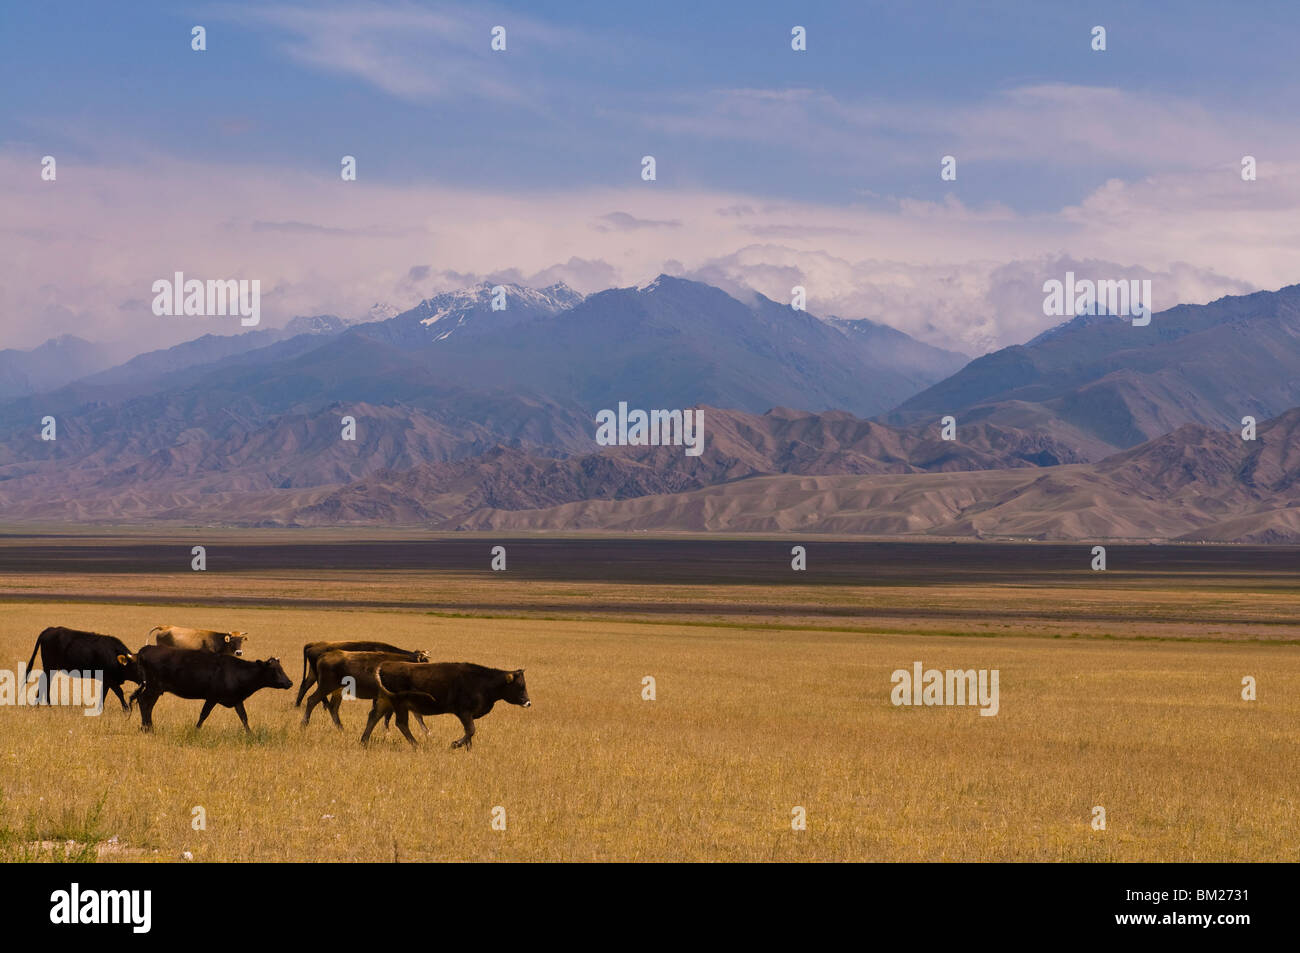 Cattle walking through pastureland, mountains in background Torugart Pass, Kyrgyzstan, Central Asia - Stock Image